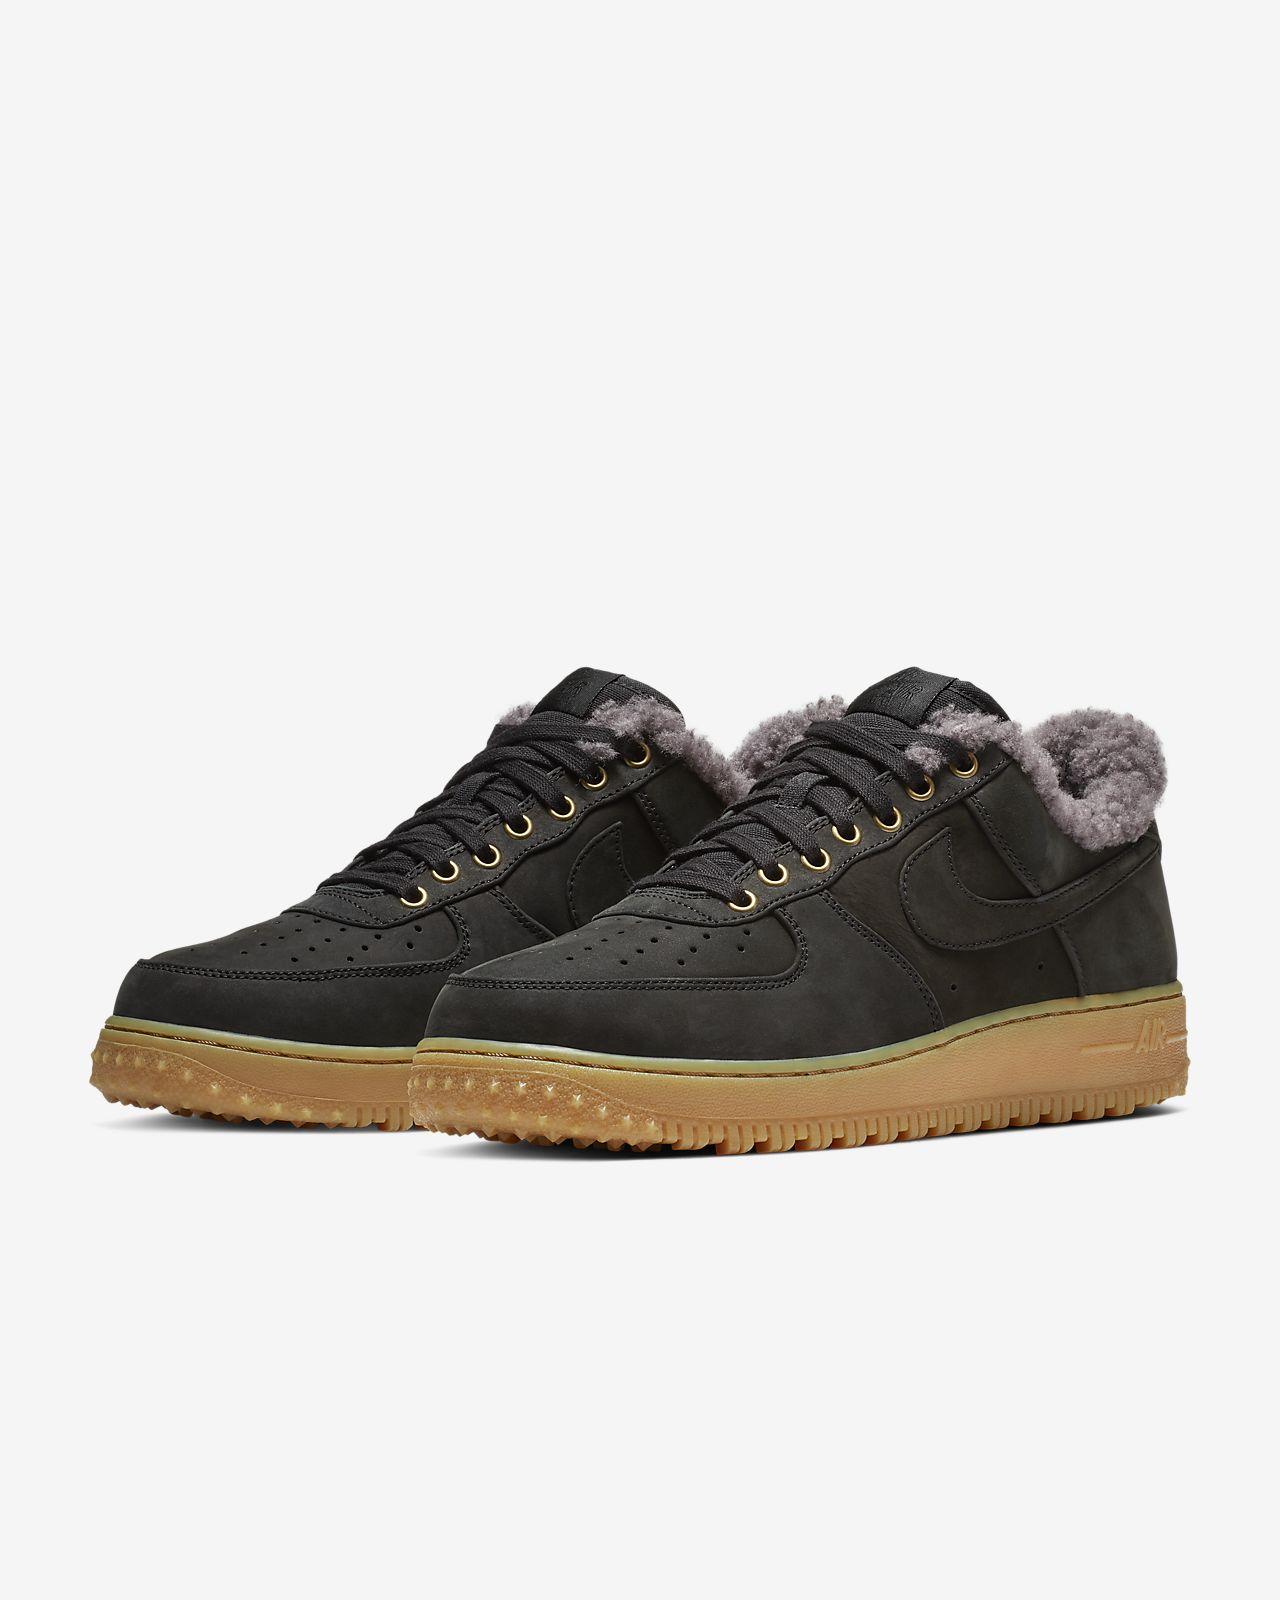 08353a84 Мужские кроссовки Nike Air Force 1 Premium Winter. Nike.com RU